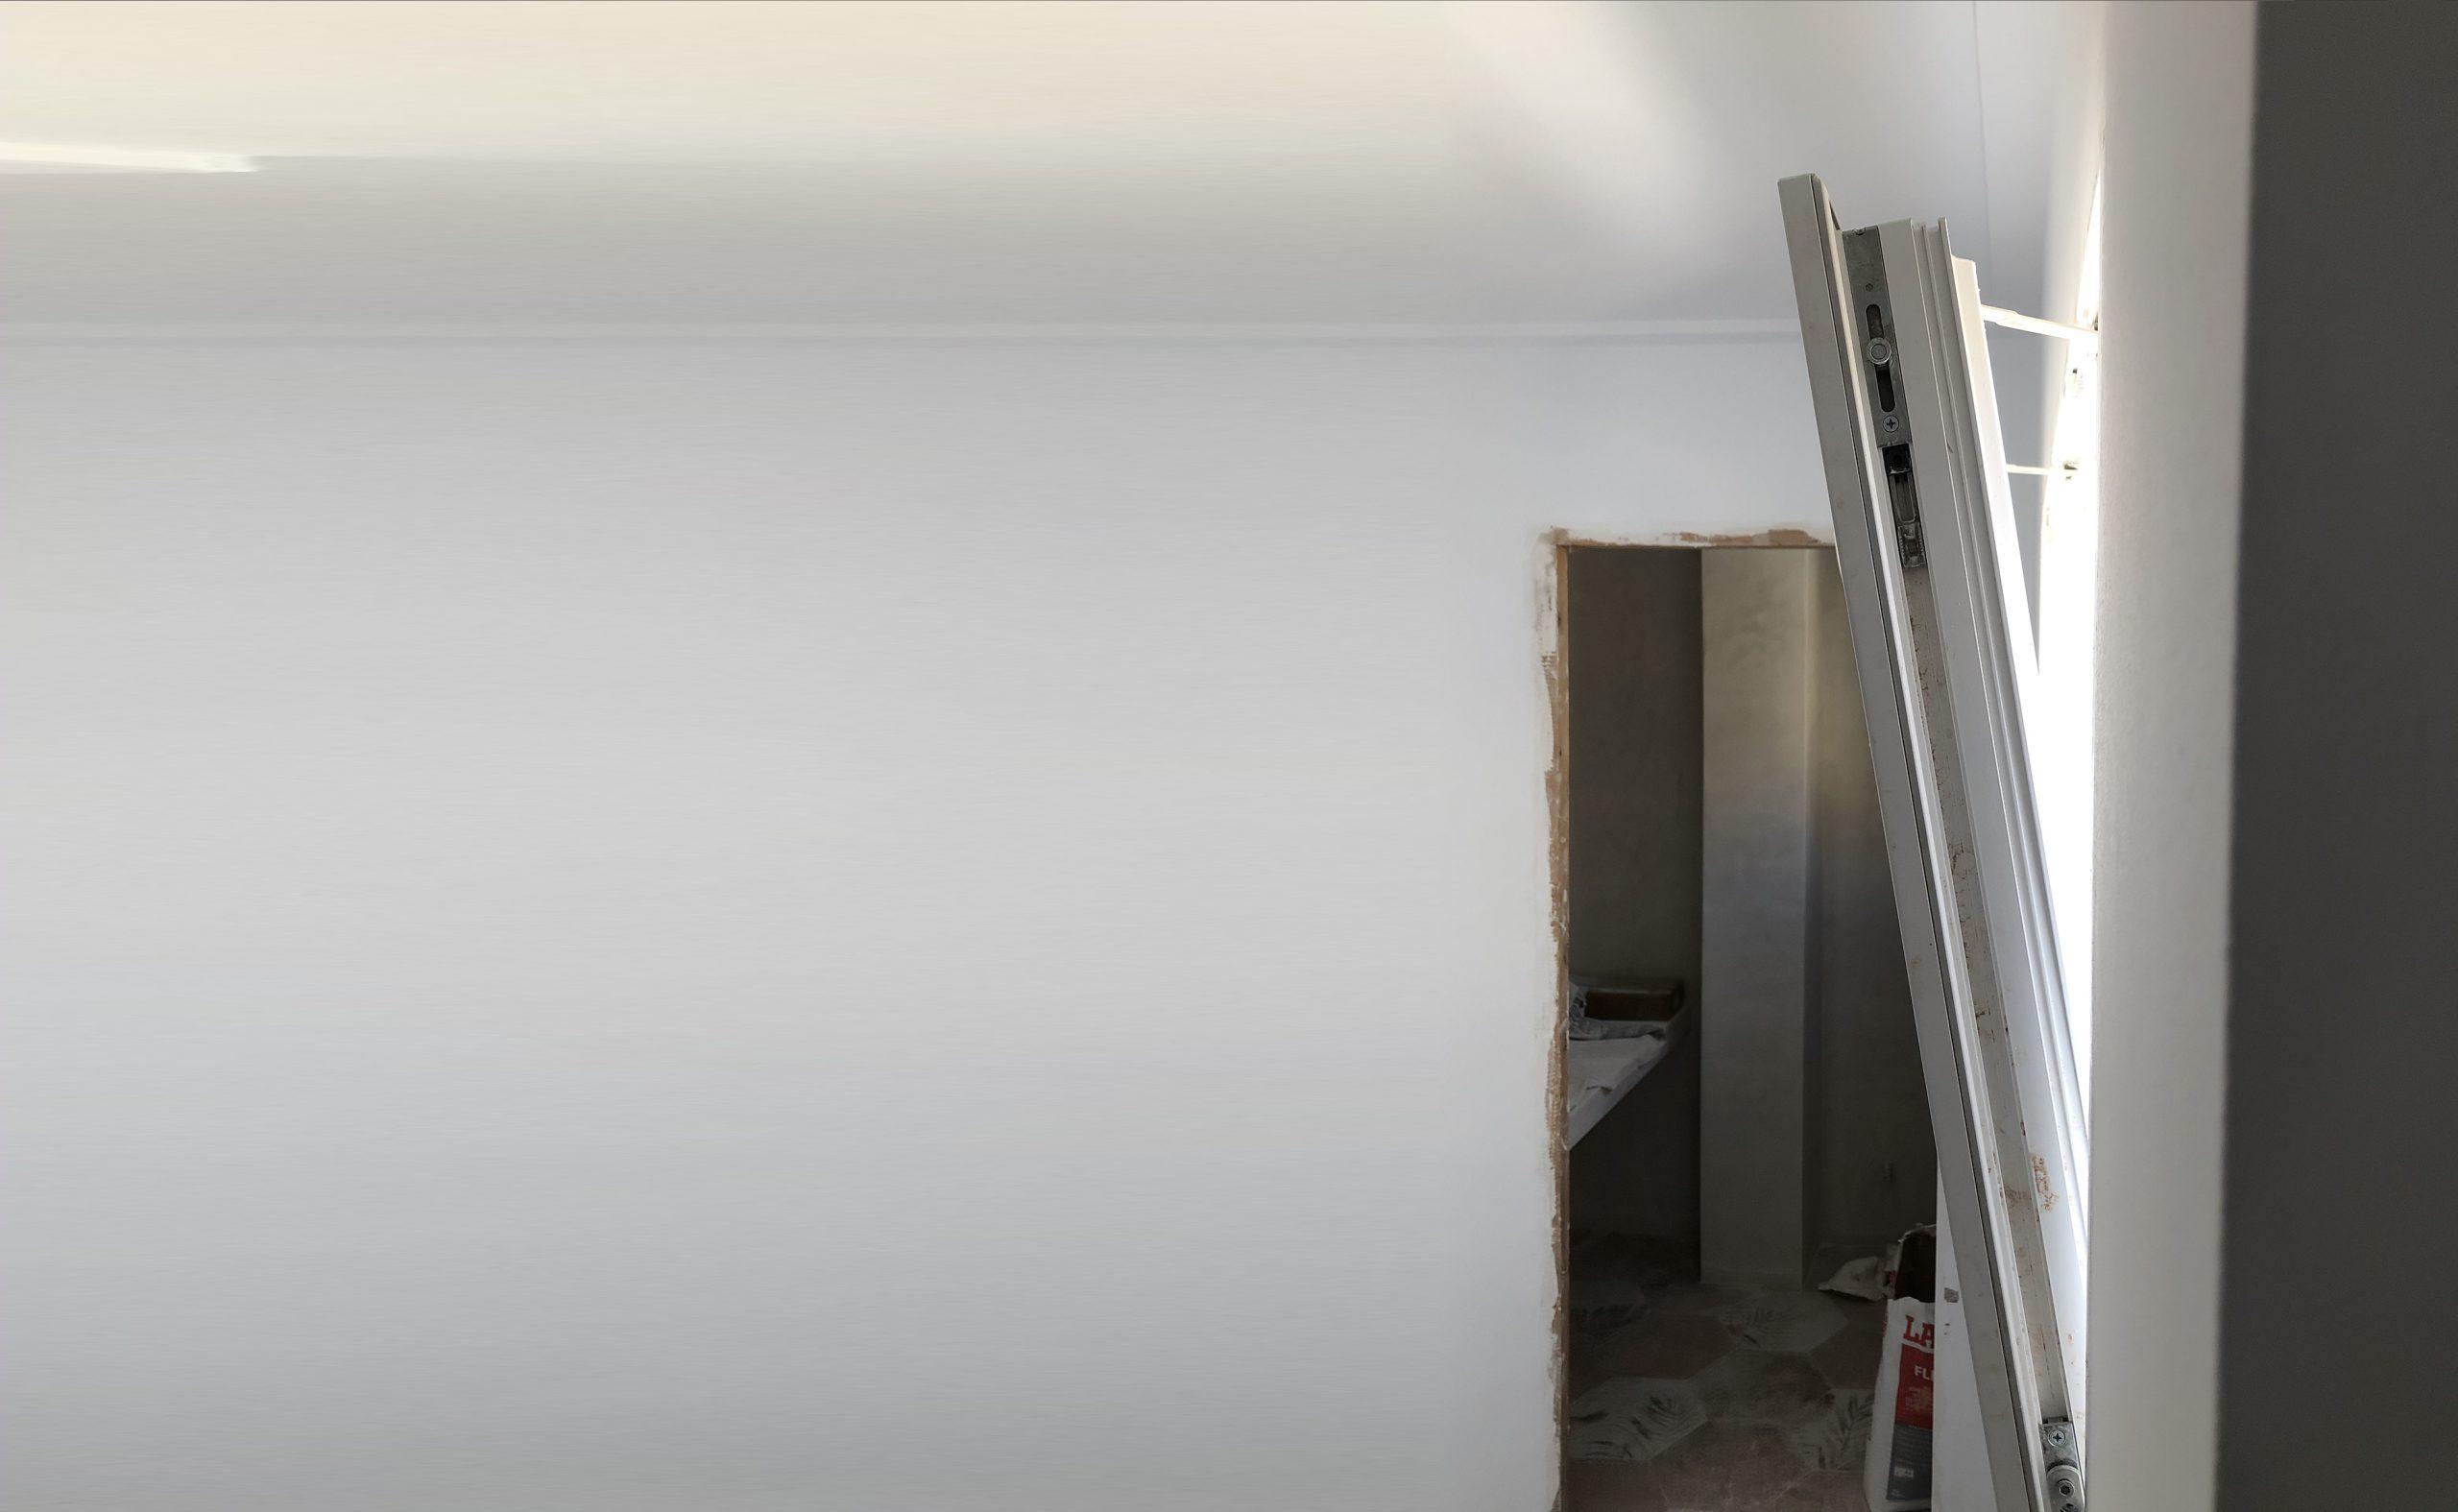 ventanas de pvc en blanco